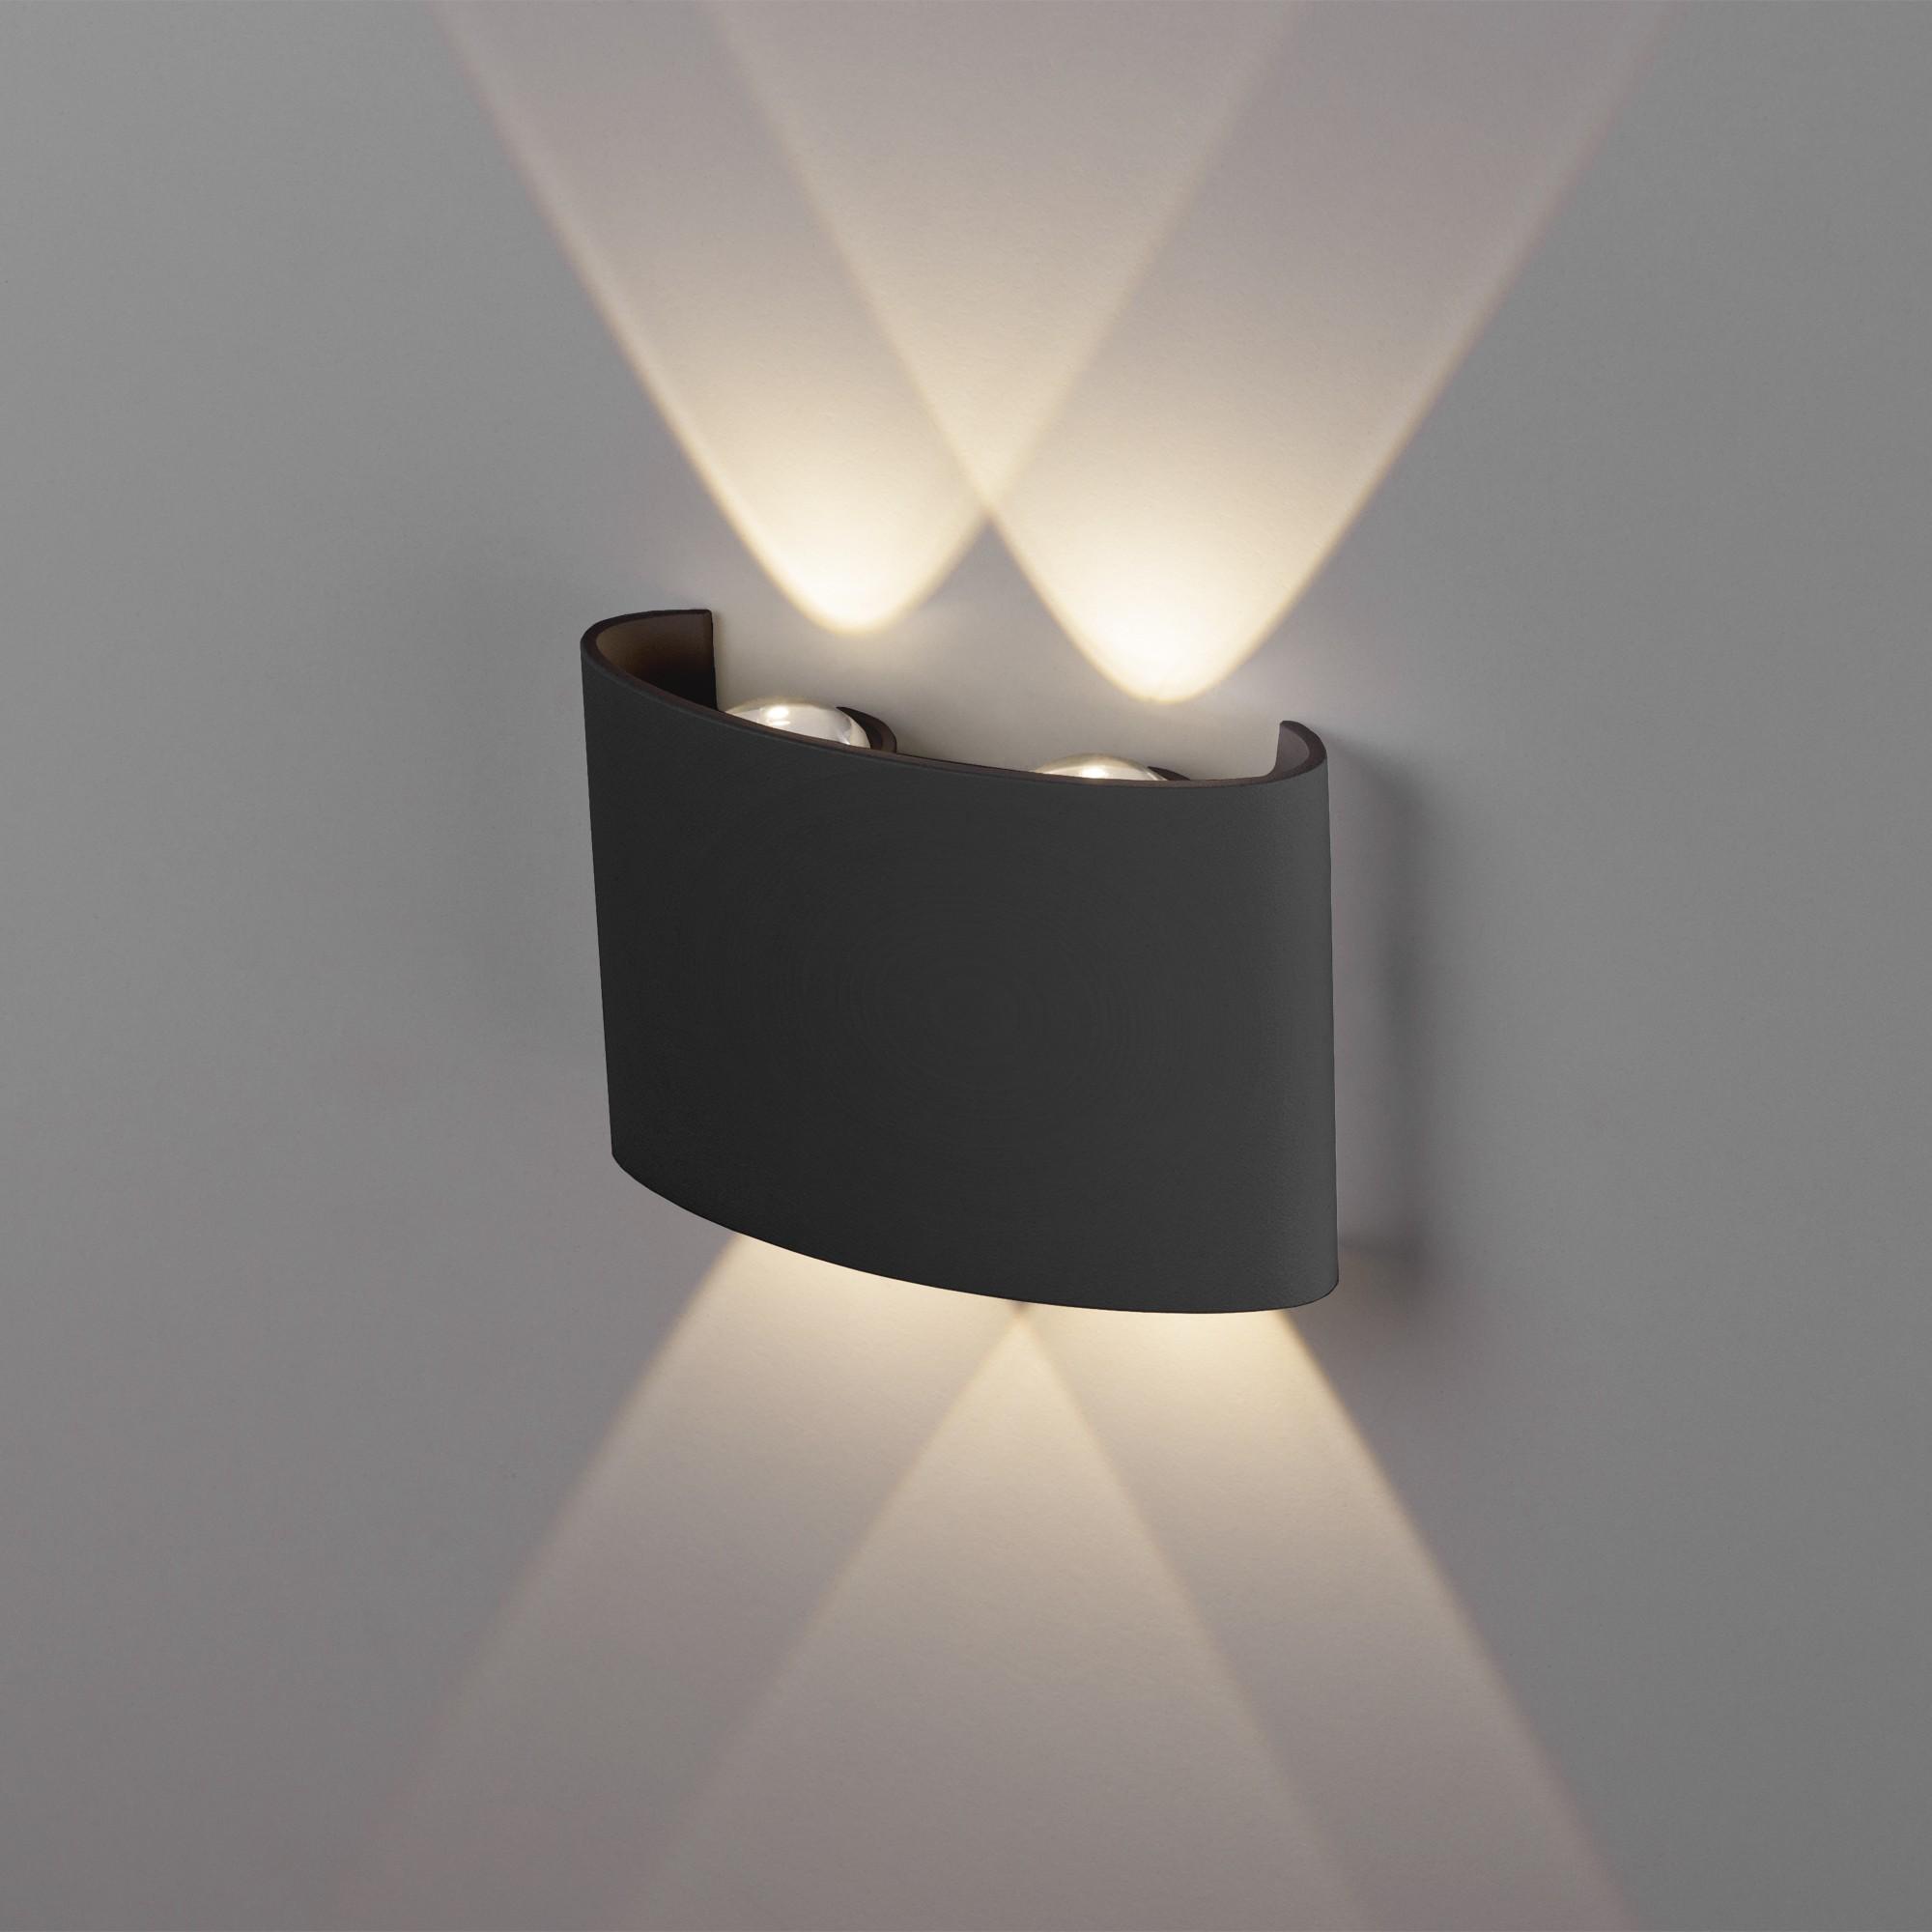 1555 TECHNO LED TWINKY DOUBLE черный